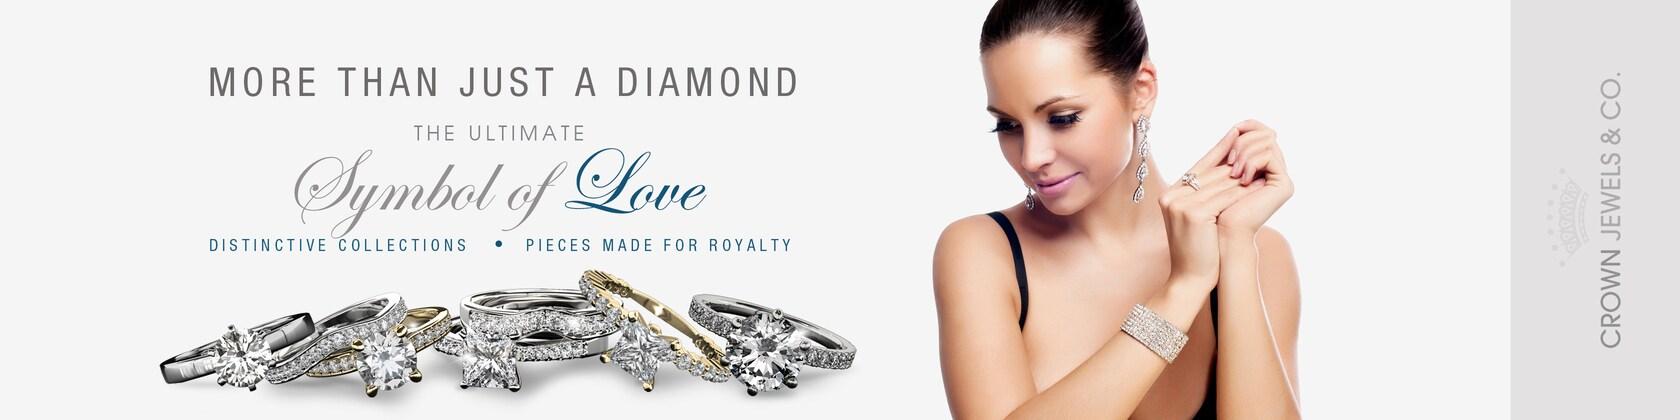 Diamond Engagement Rings and Fine Diamond Jewelry von CrownJewelsCo